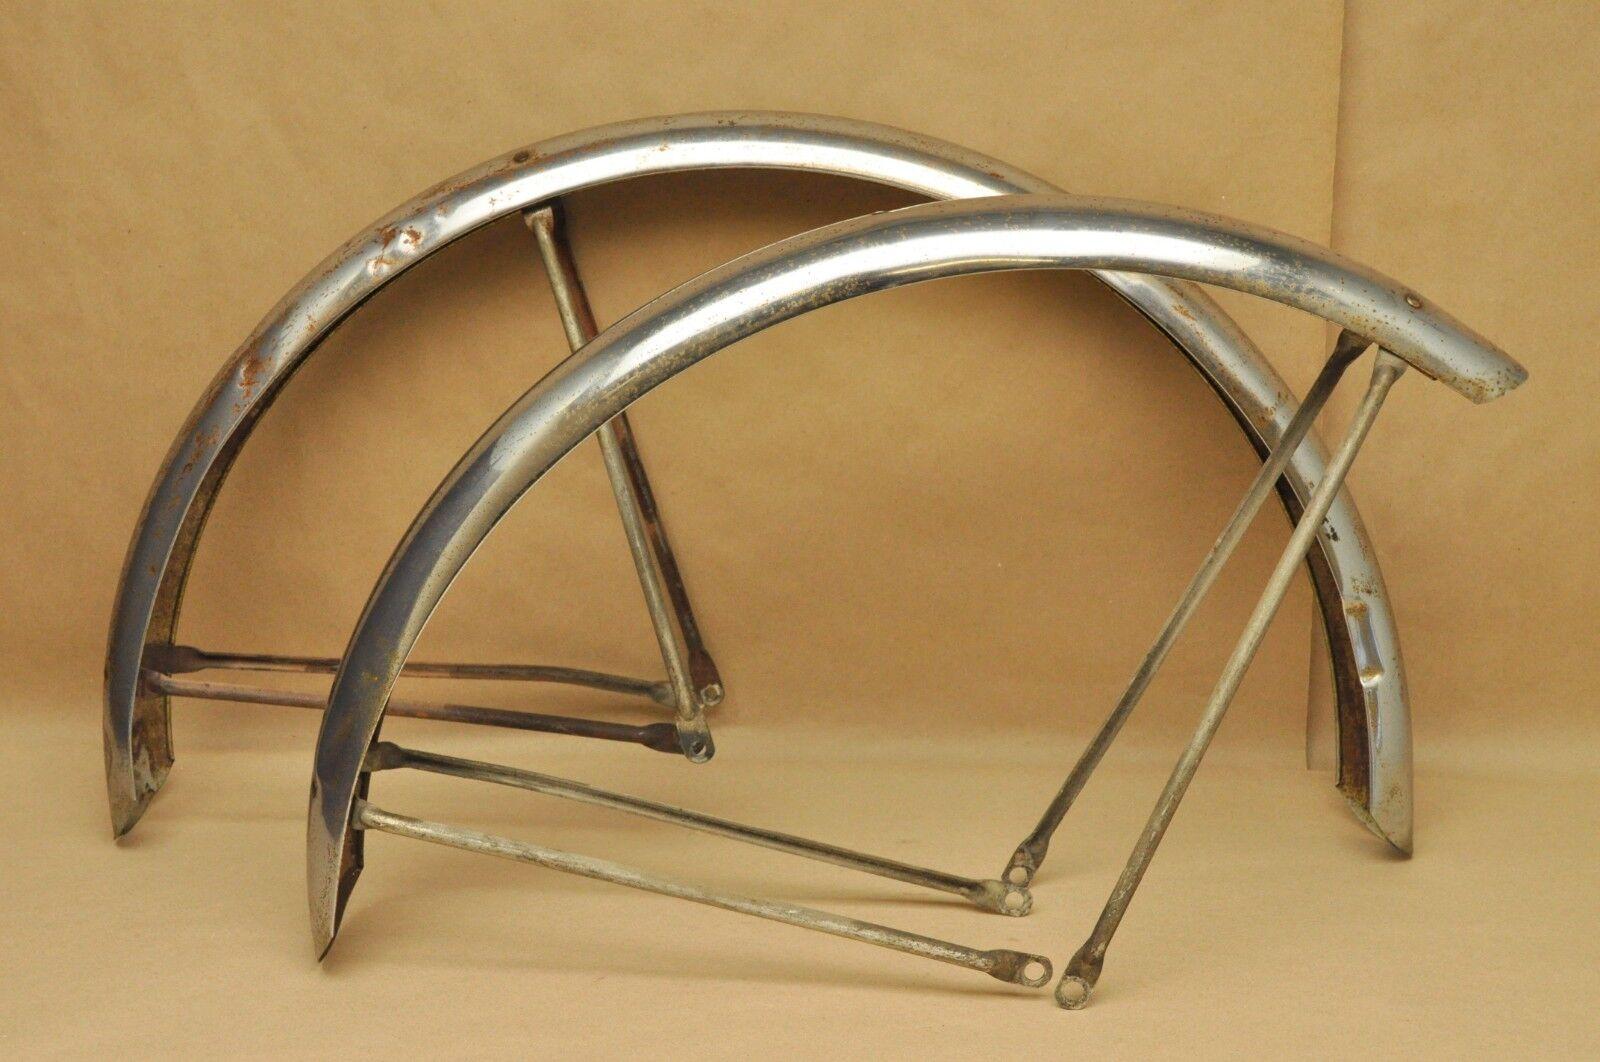 Vintage 1967  Schwinn Typhoon Bicycle Fenders Front & Rear  offering 100%